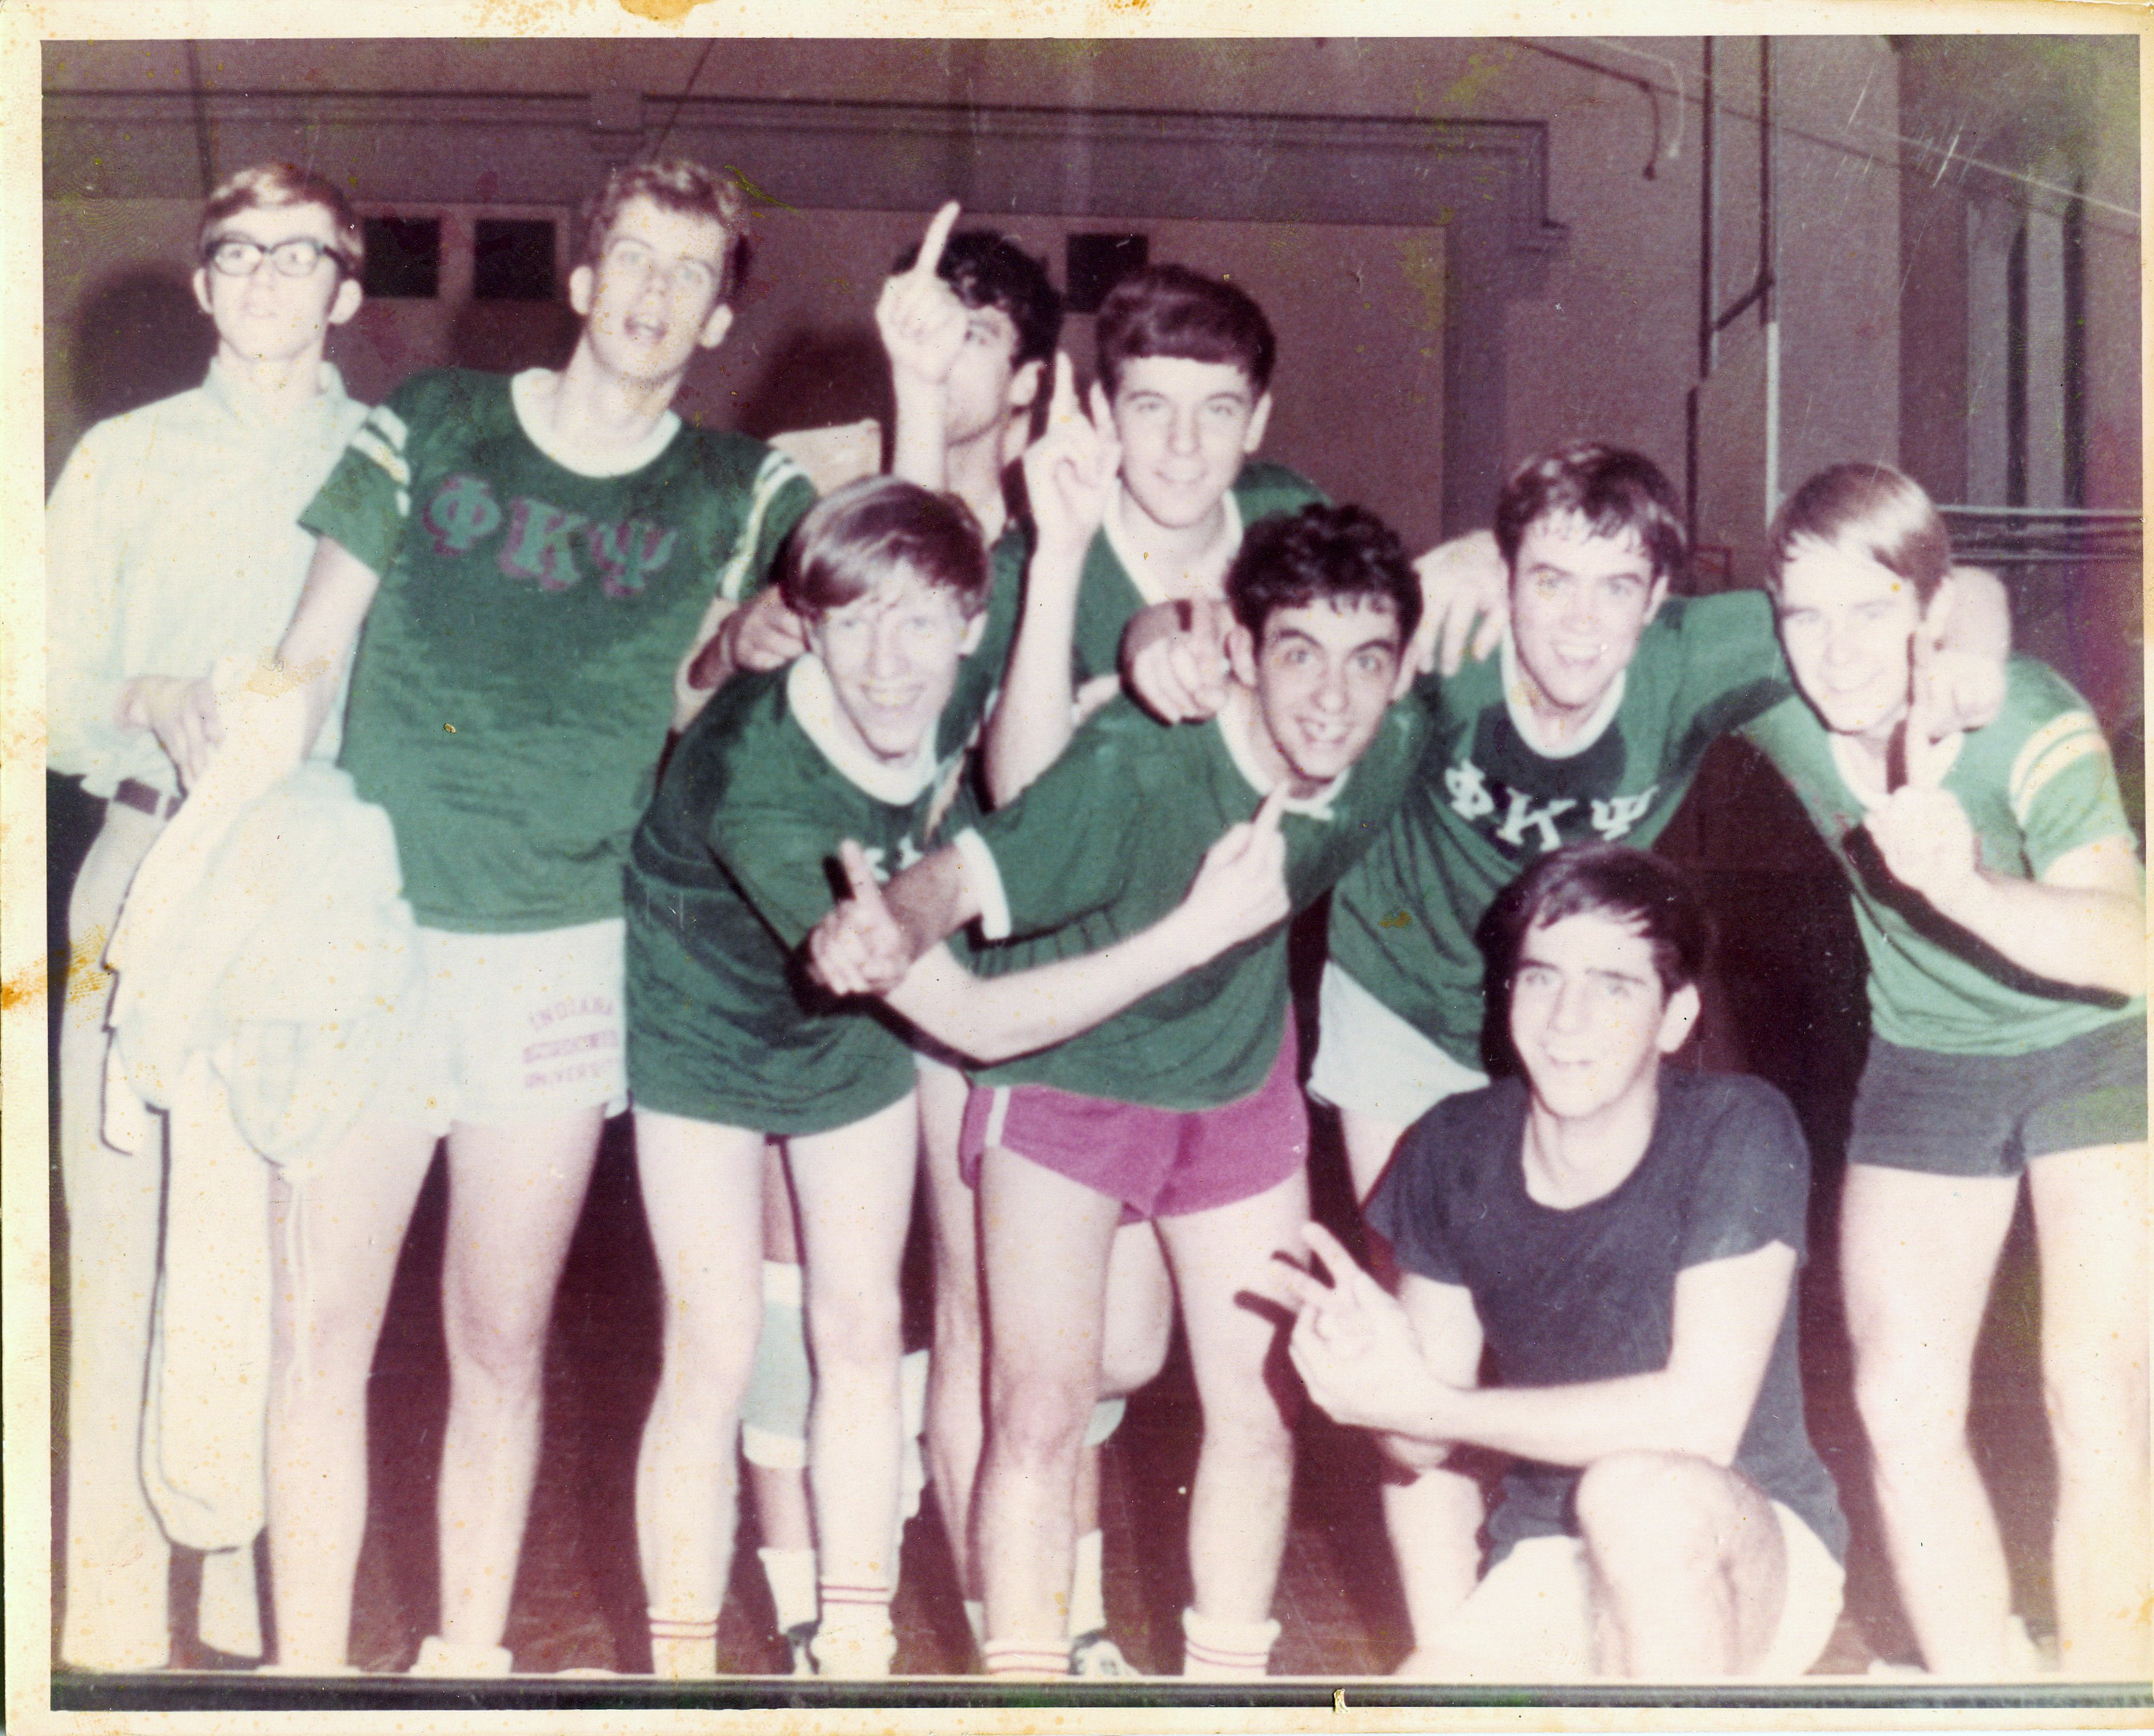 1969 basketball team